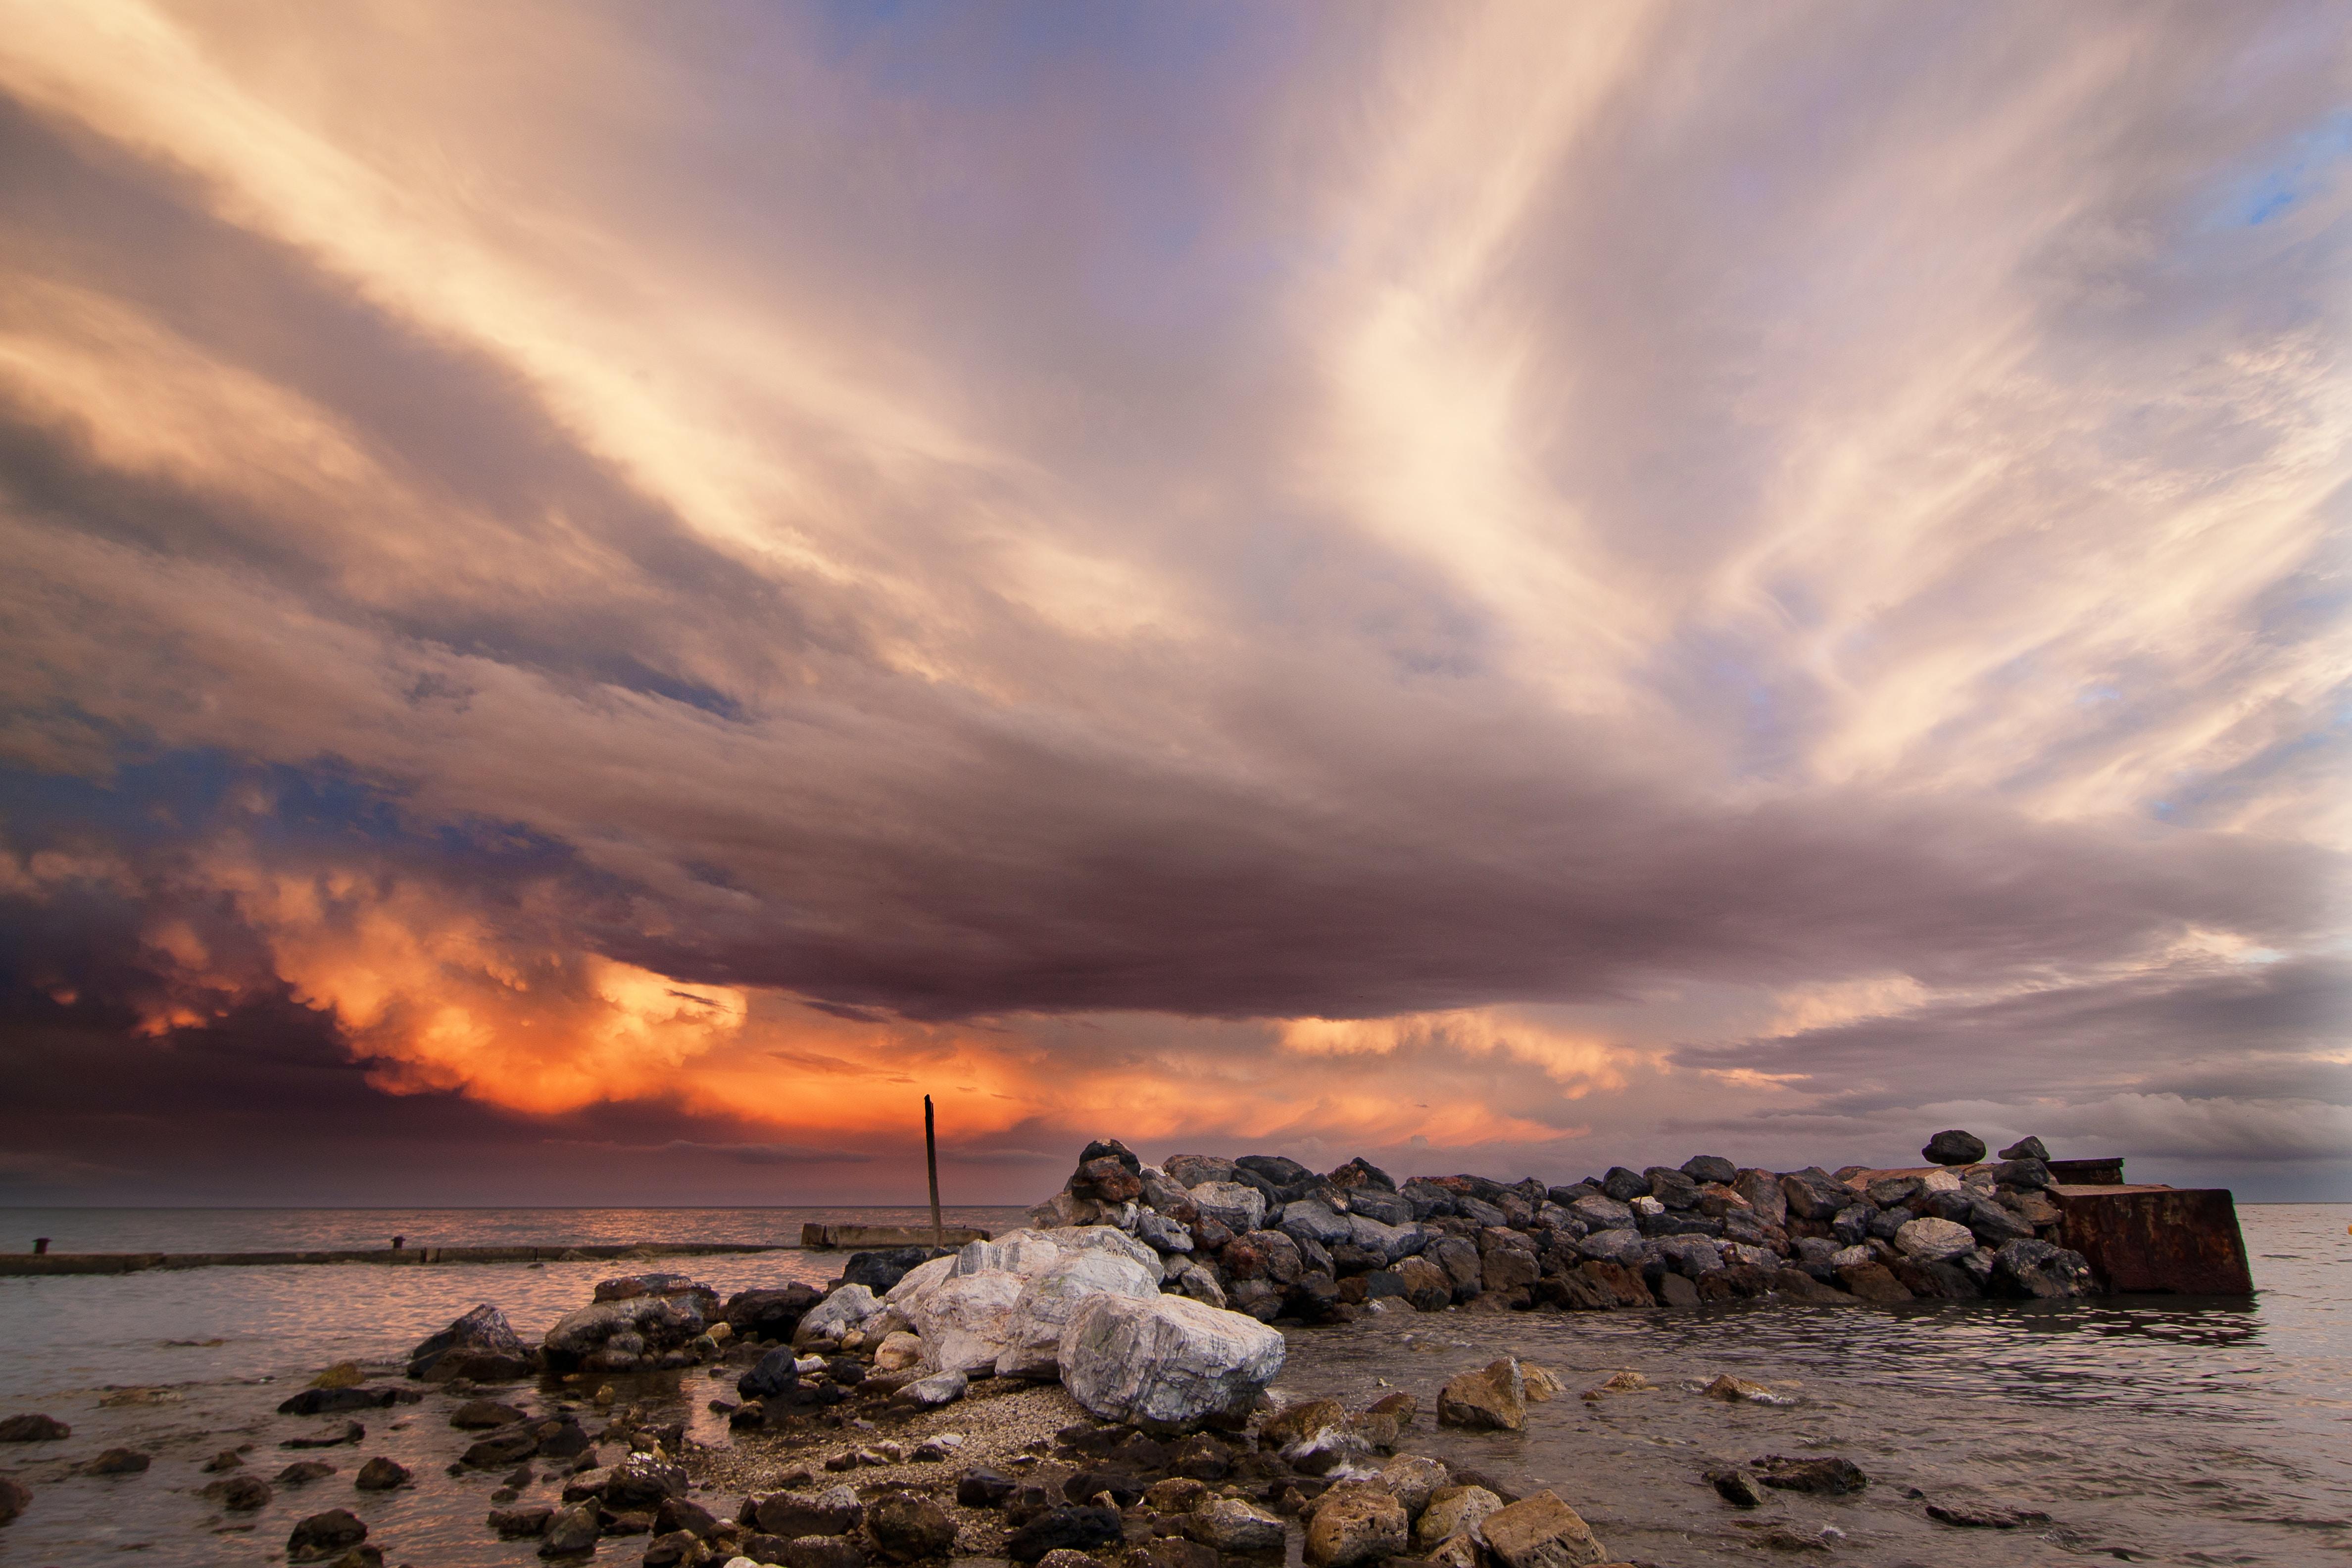 pile of stones near seashore under cloudy sky